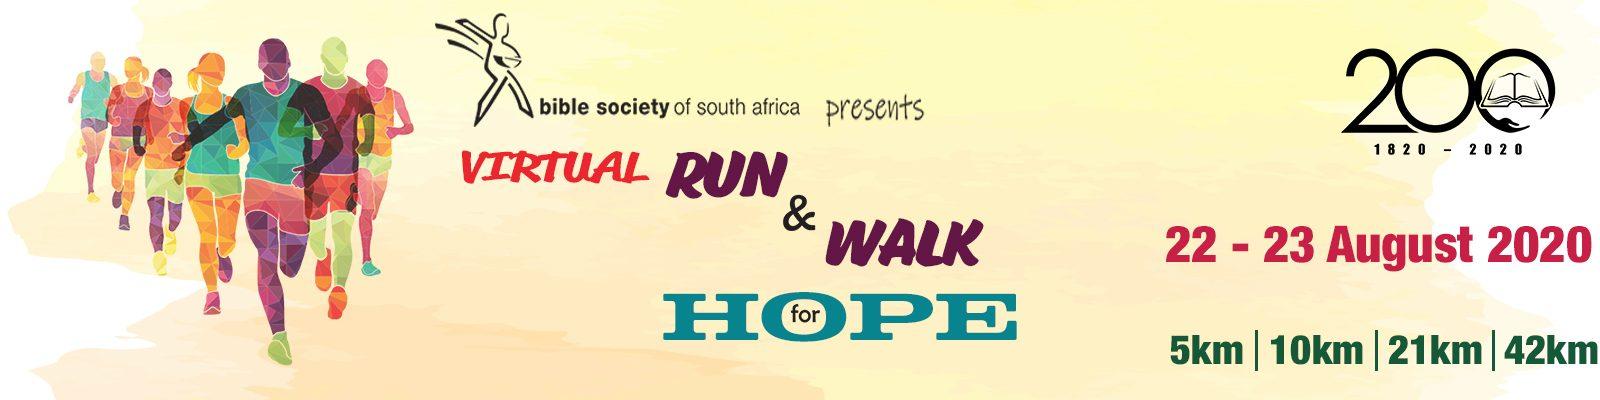 Run-Walk-for-Hope-Web-Header-6vpwv6qj4aqd91ib6284yi9vncjok209cpzs1r5zzj4 Submit Your Run and Walk Time